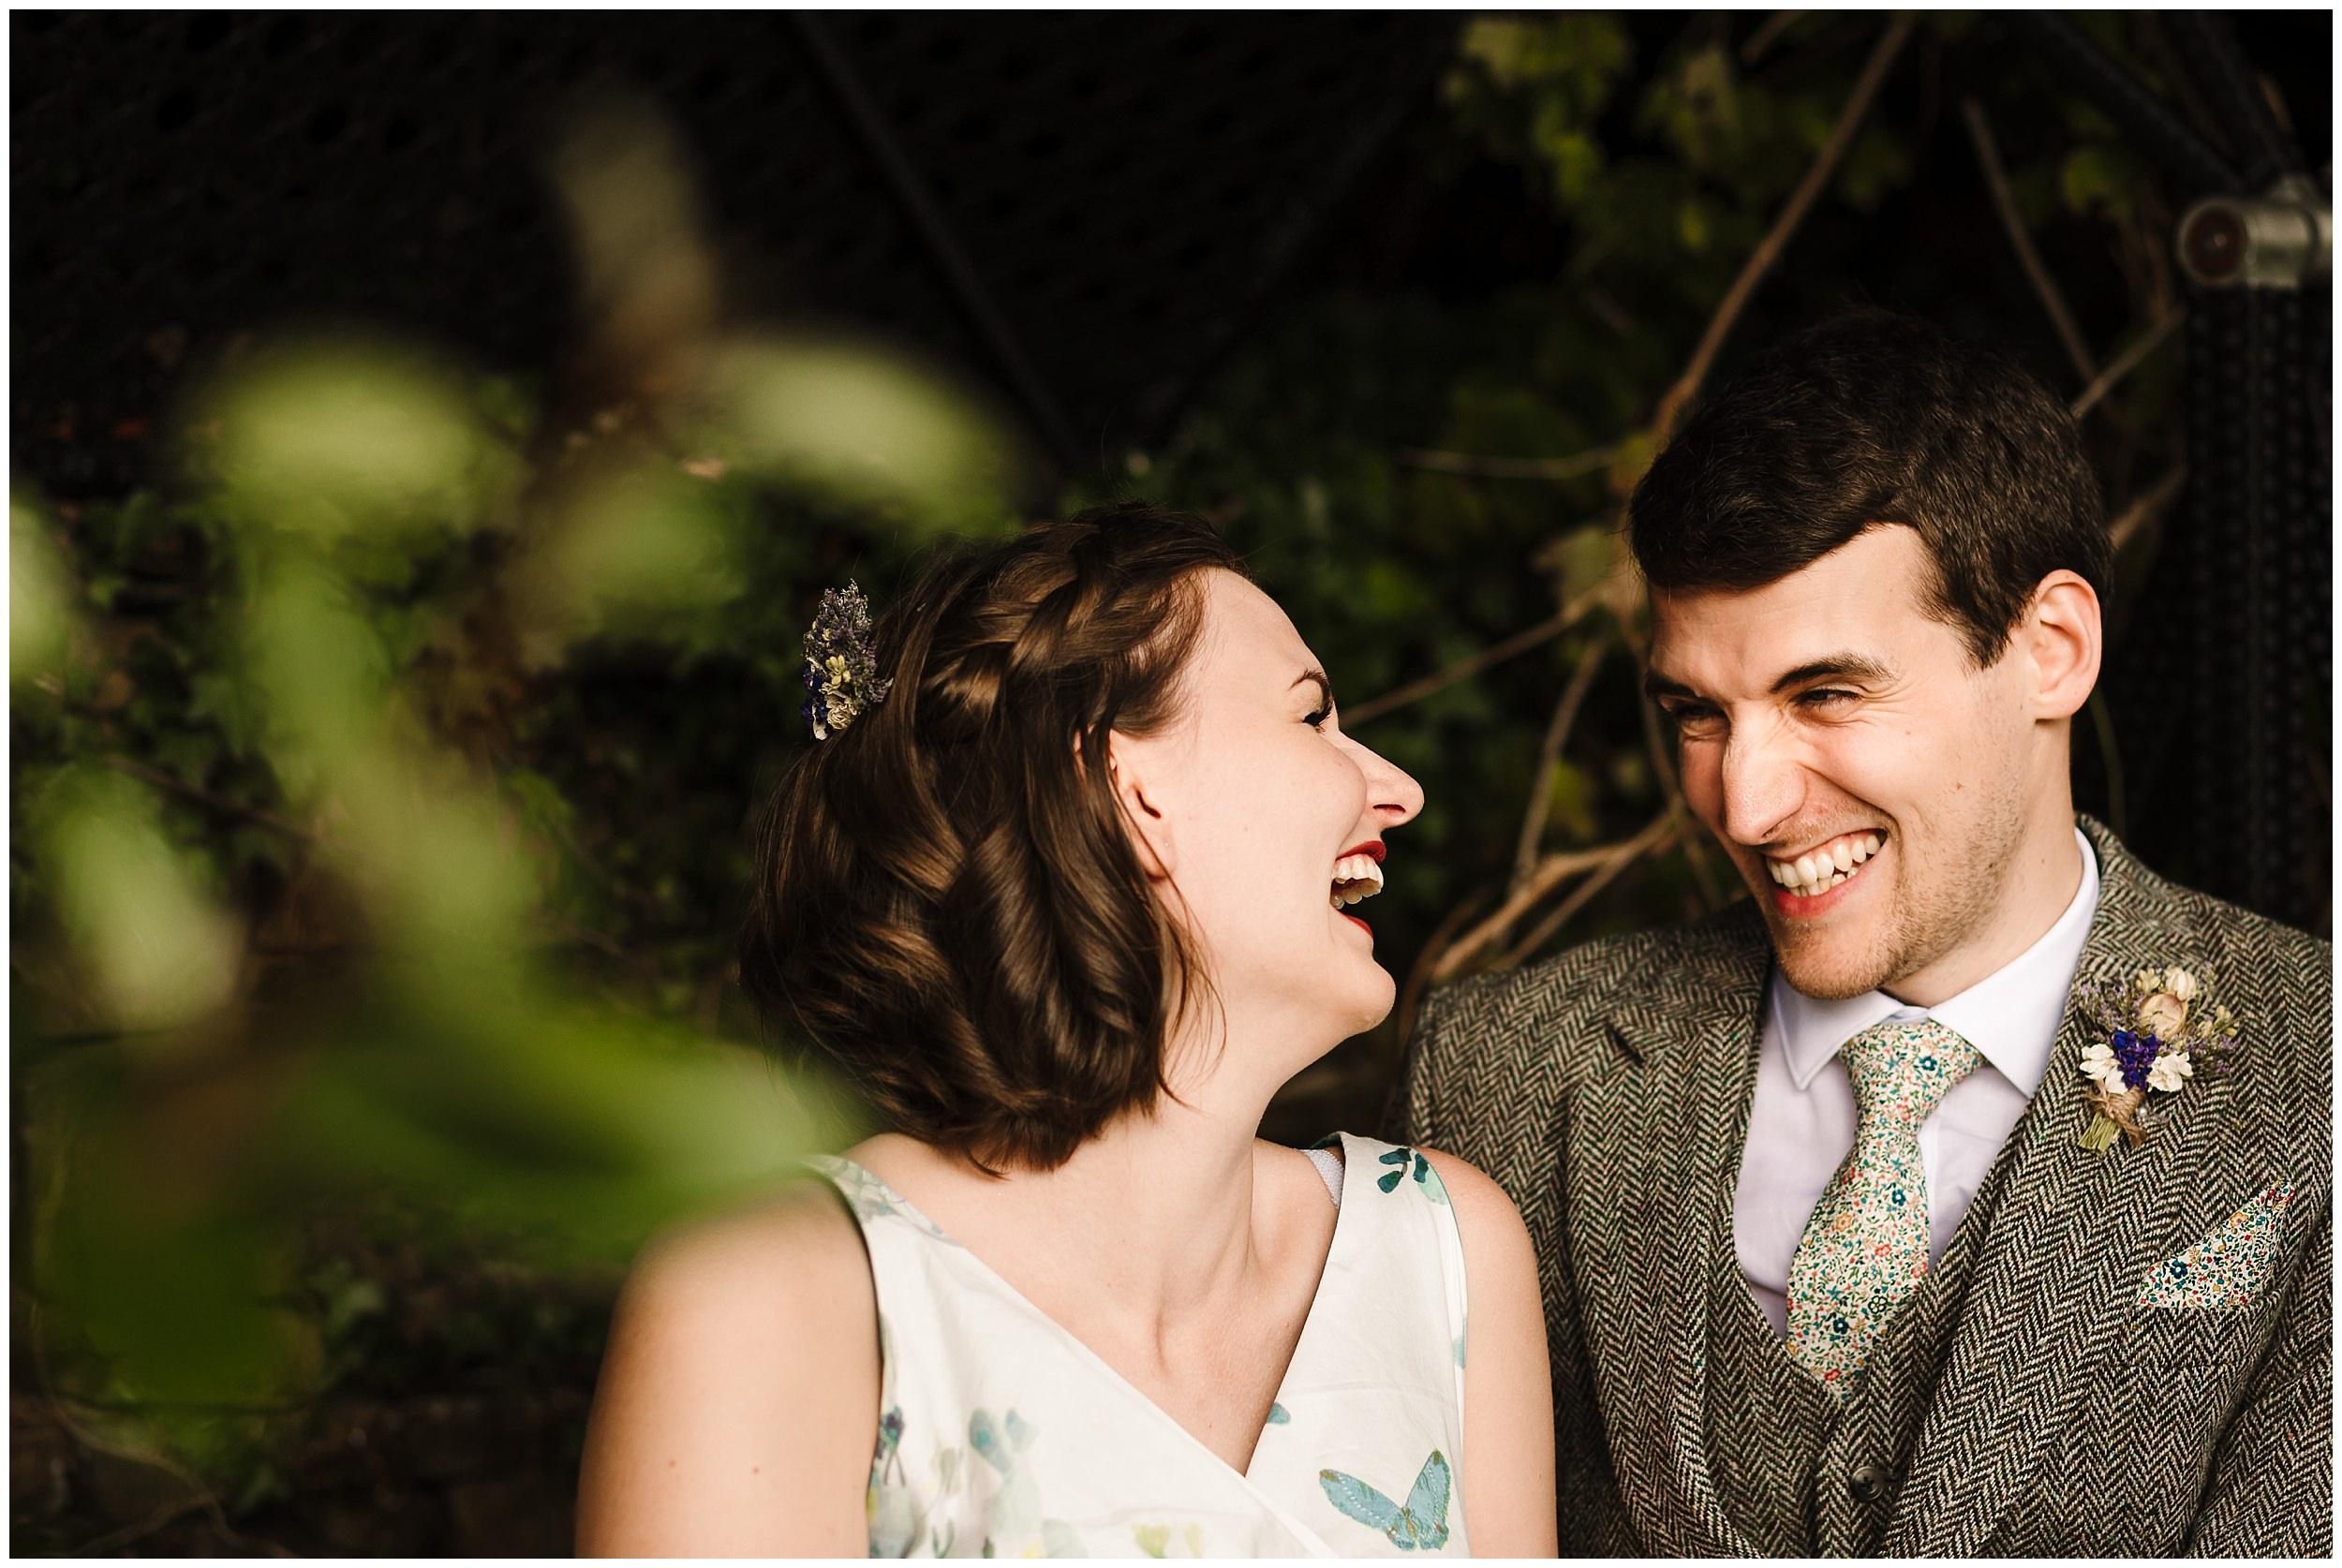 YORKSHIRE OUTDOOR WEDDING PHOTOGRAPHER LUCY ALEX_0030.jpg